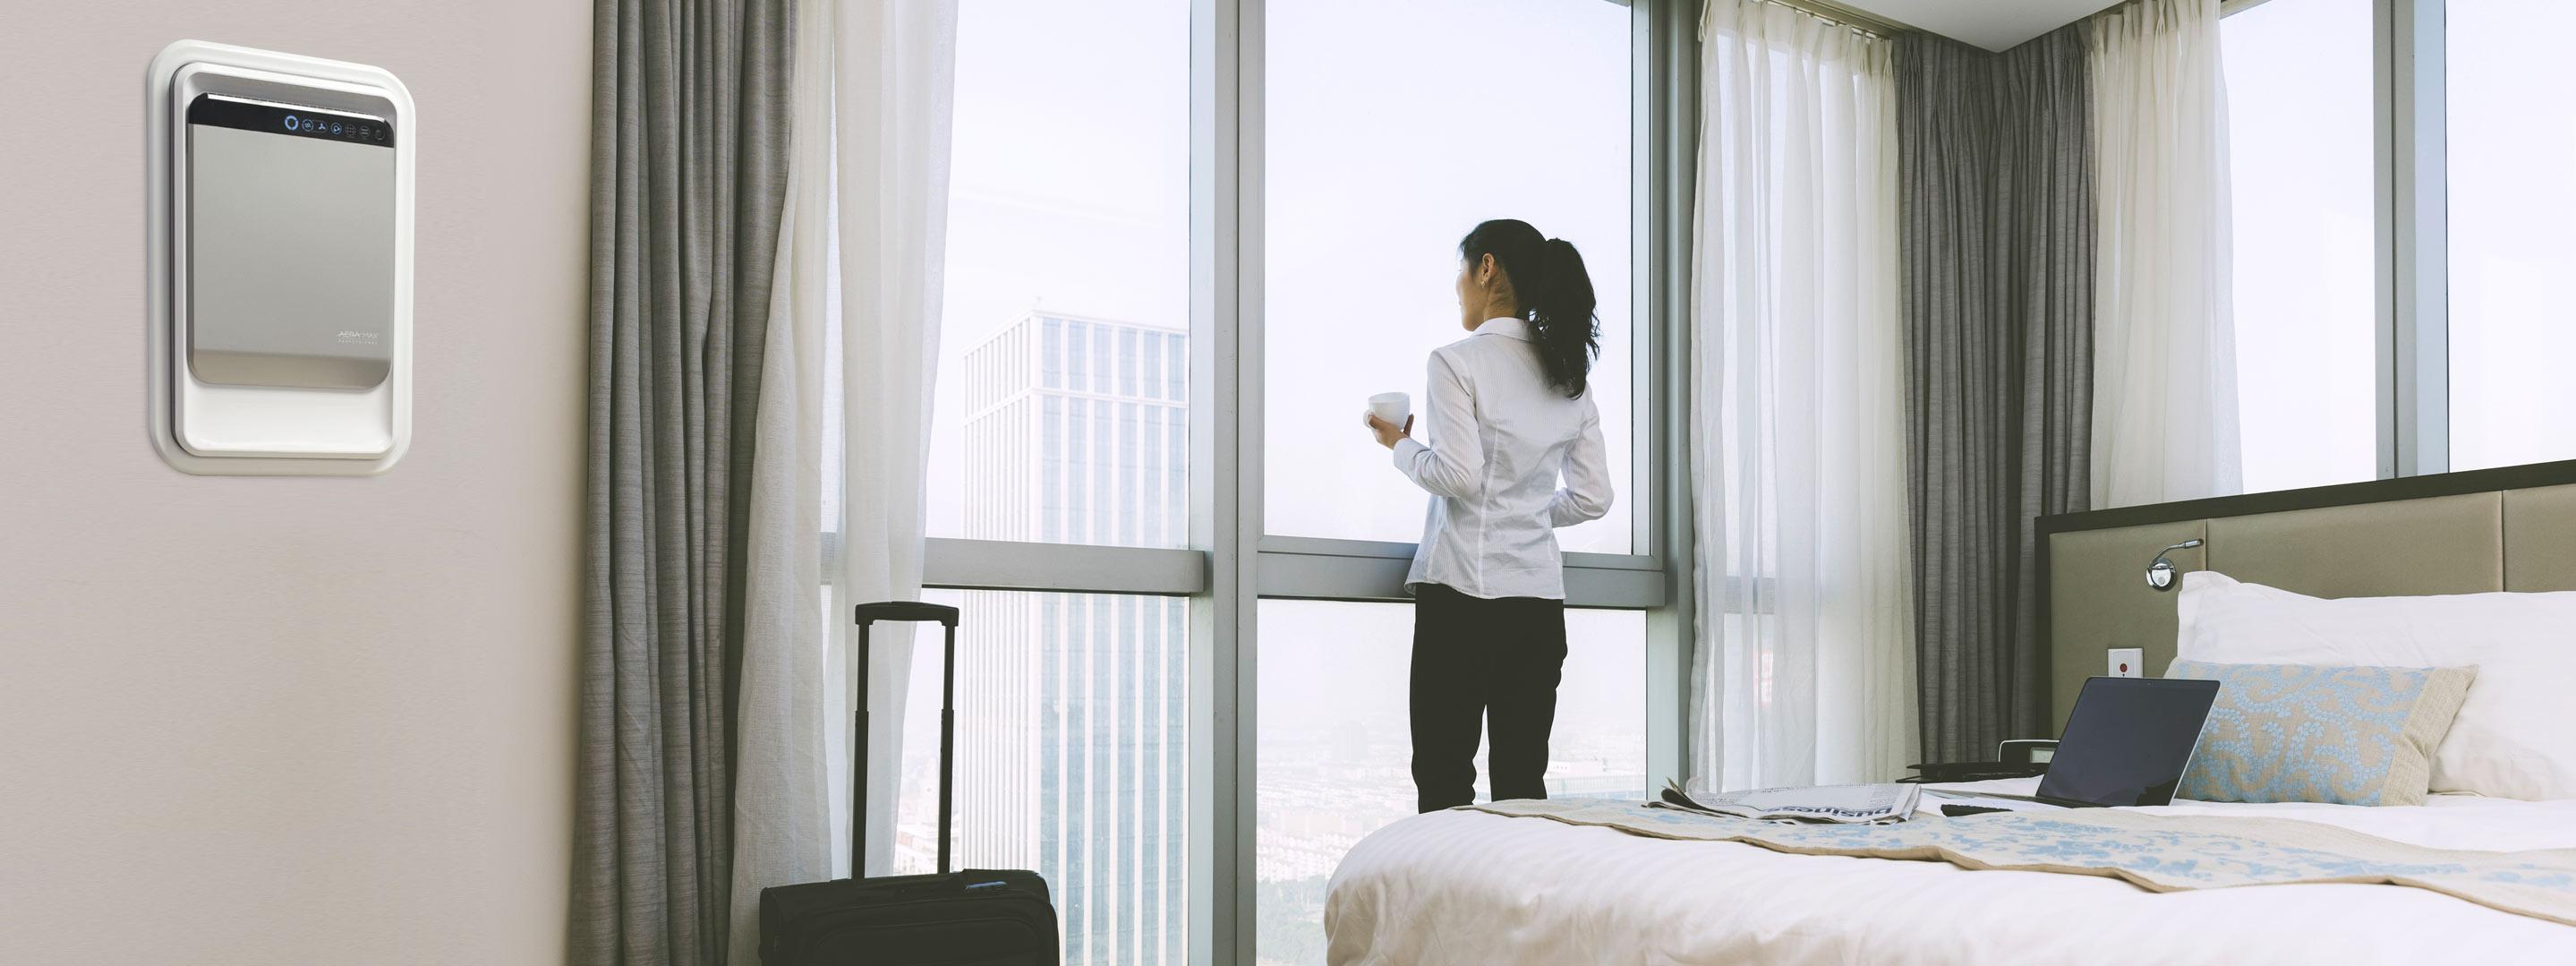 AeraMax Professional – Hotelarstwo,Gastronomia, SPA, Fitness